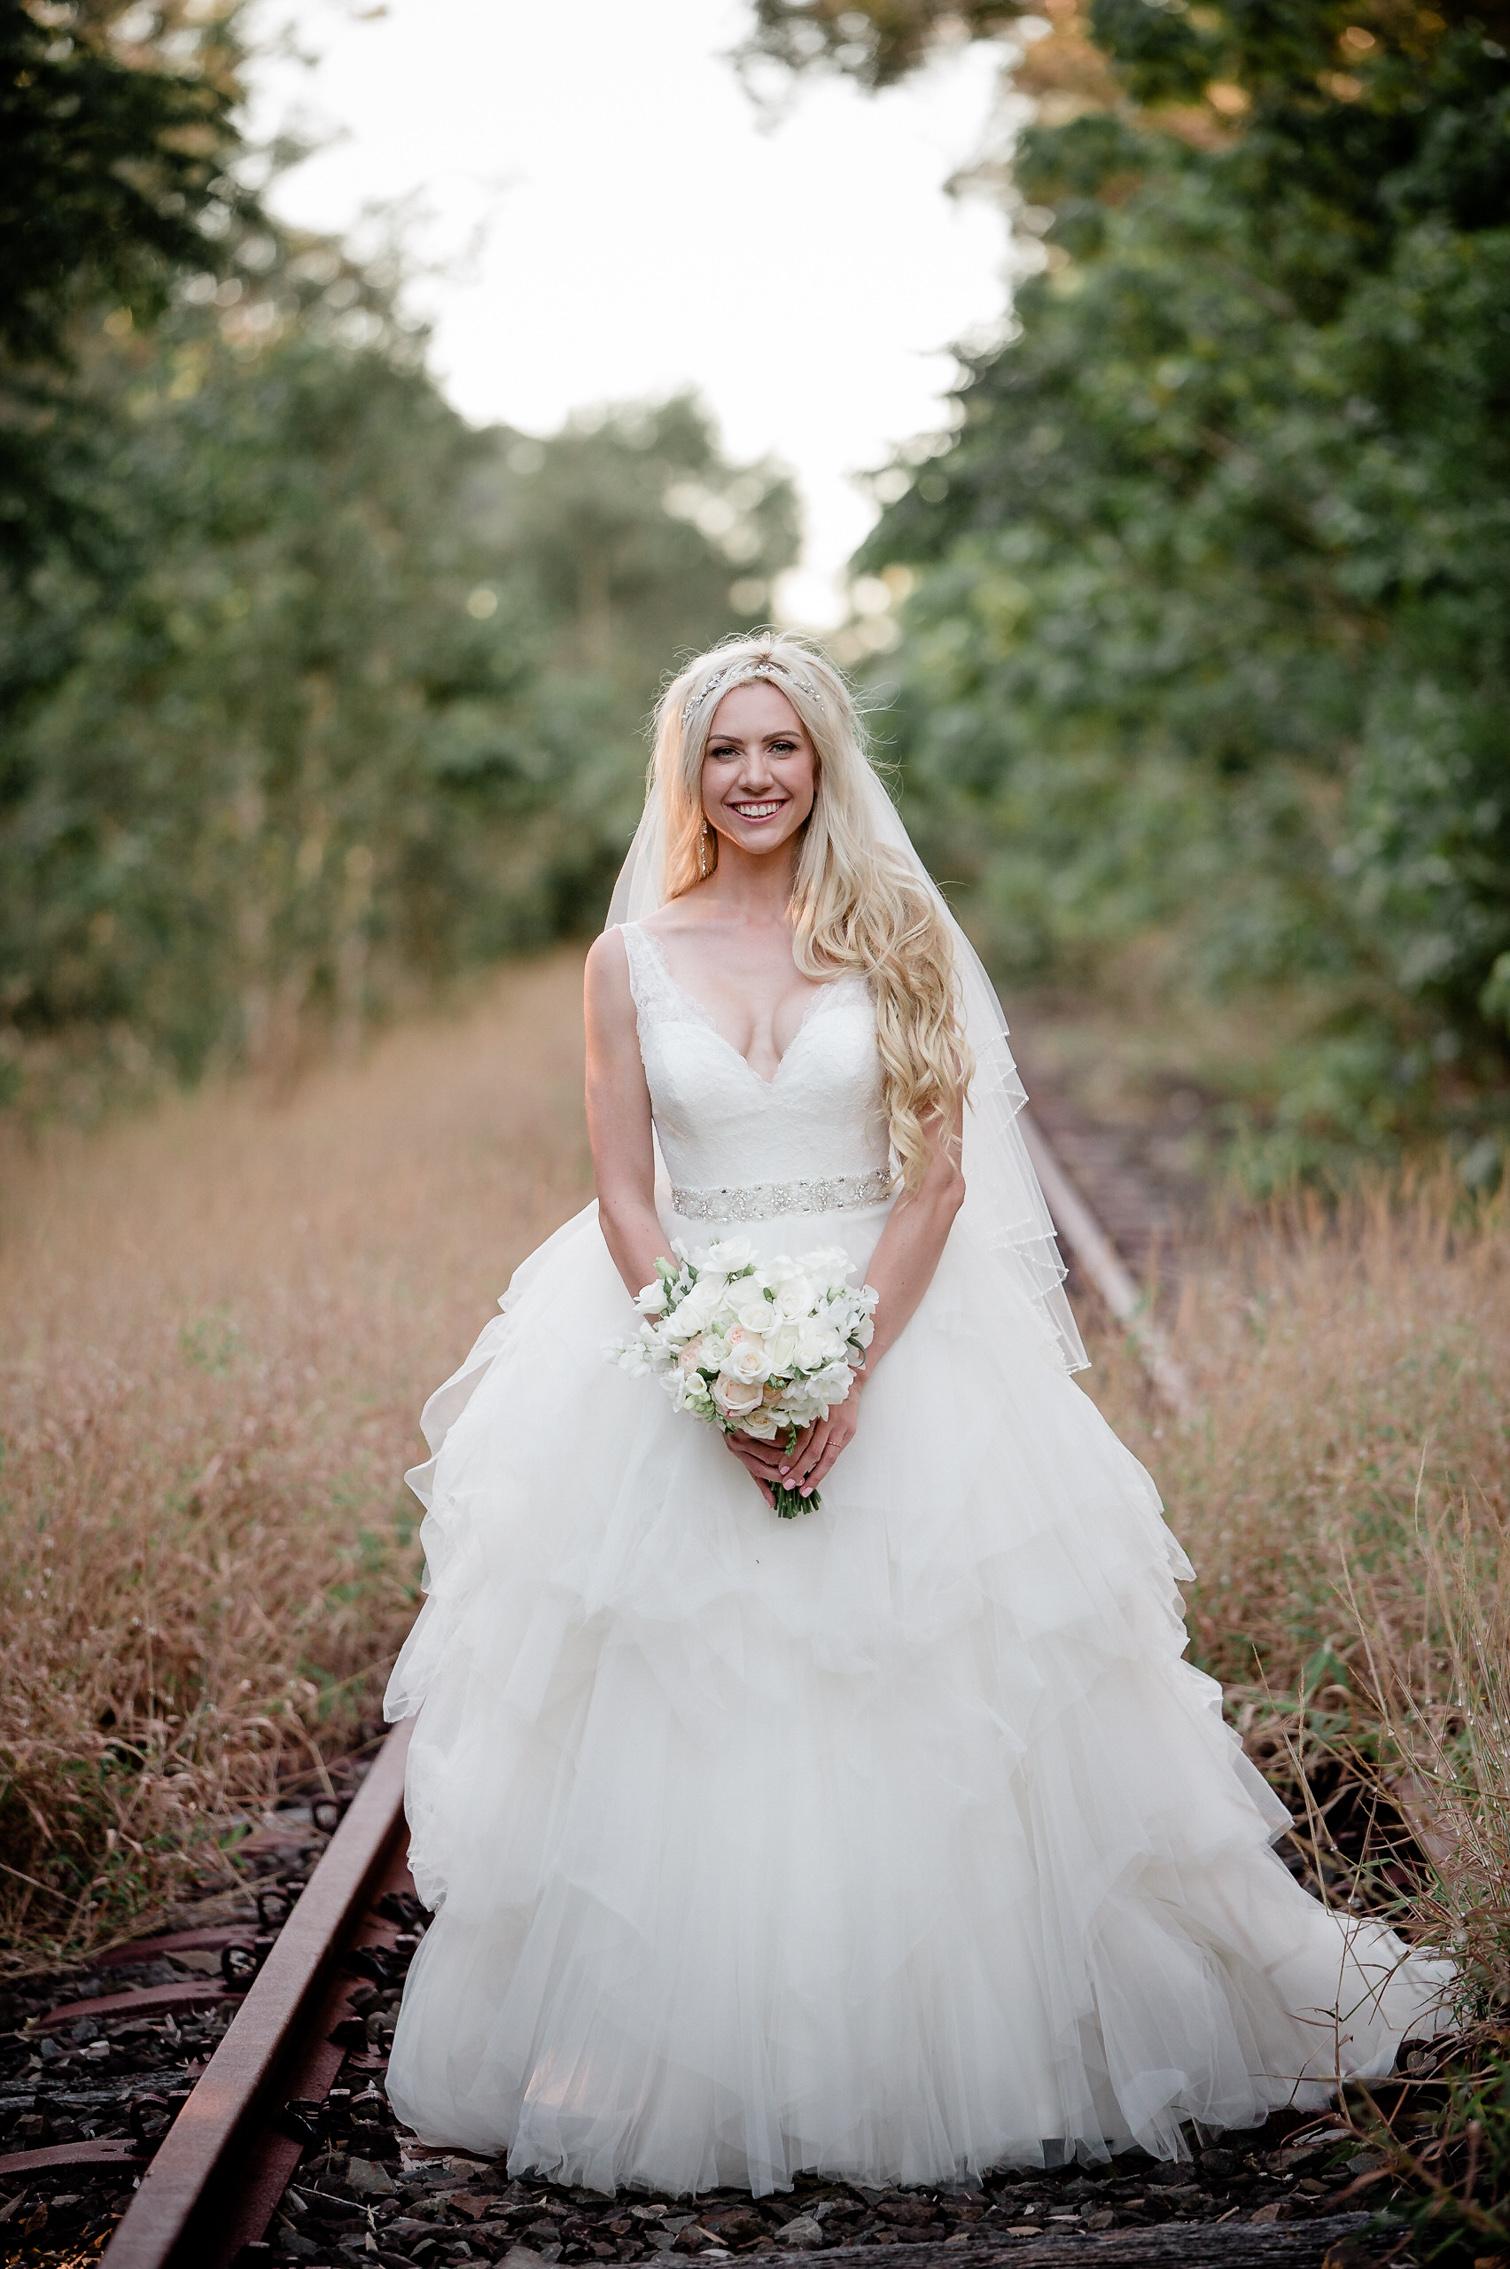 The_Belongil_Byron_Bay_Weddings_New_Black_Studios-131.jpg